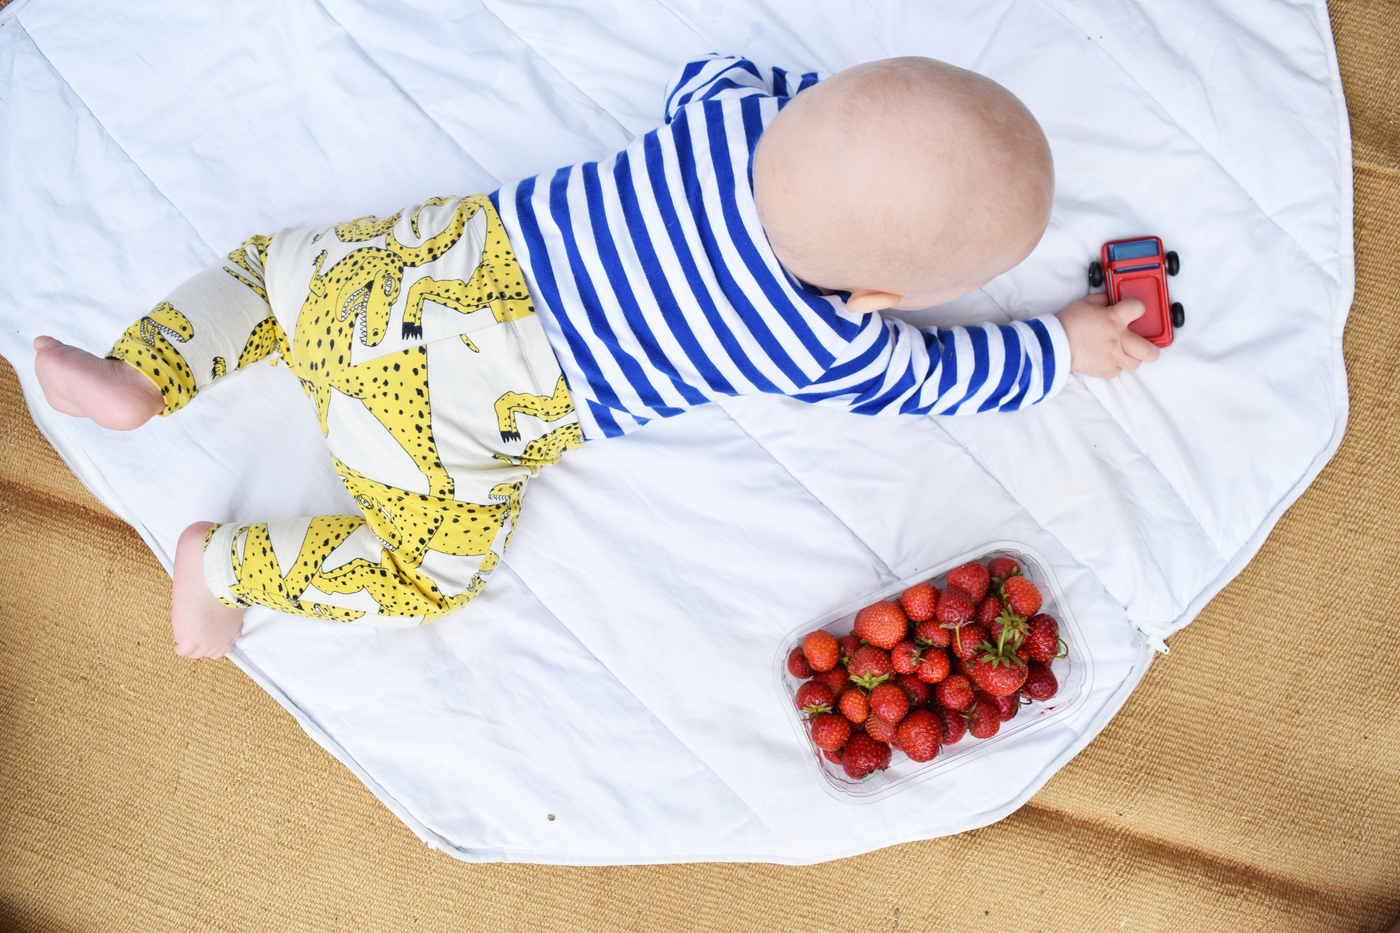 vauva ja mansikat.jpg